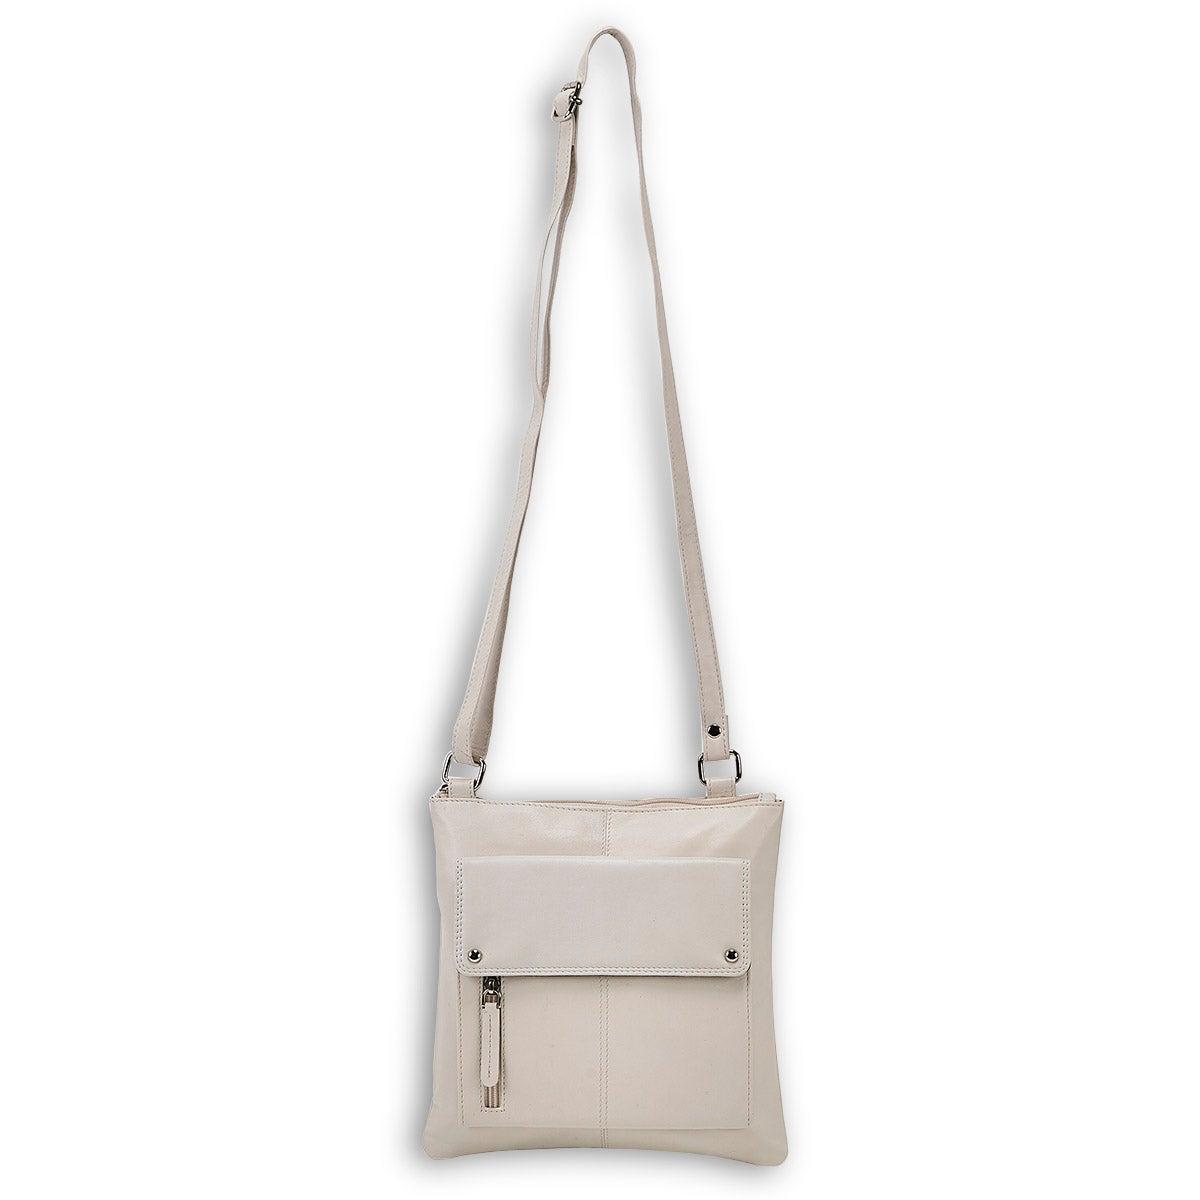 Lds cream sheep lthr RFID crossbody bag